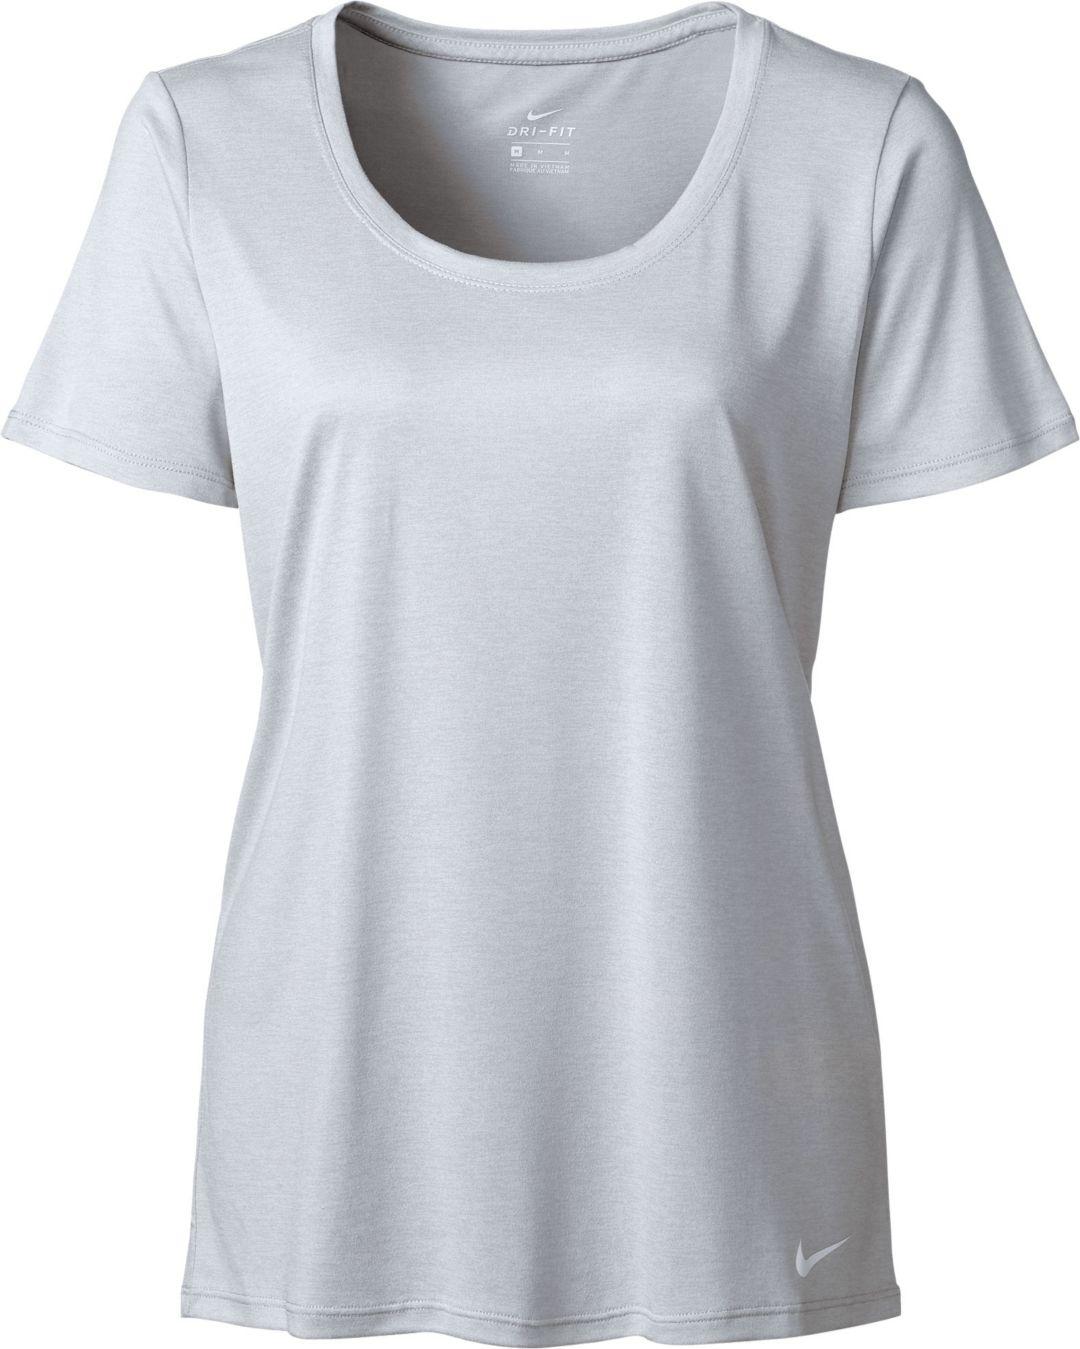 2cd4abe10 Nike Women's Dry Legend Scoop Veneer T-Shirt   DICK'S Sporting Goods